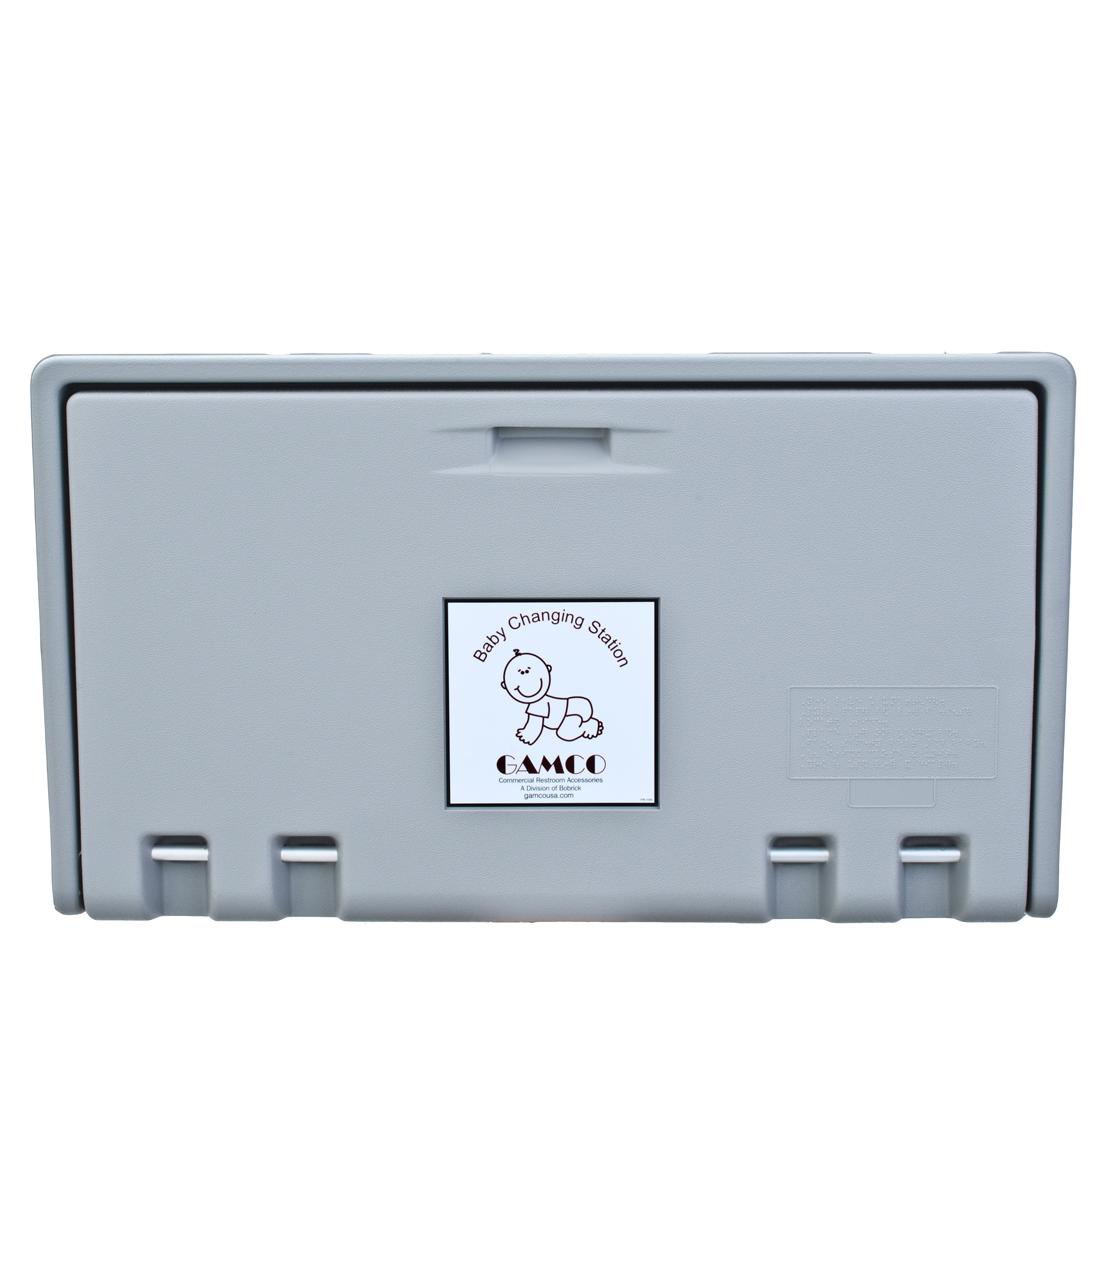 Gamco BCS-2 Horizontal Wall-Mounted Baby Changing Station - Grey